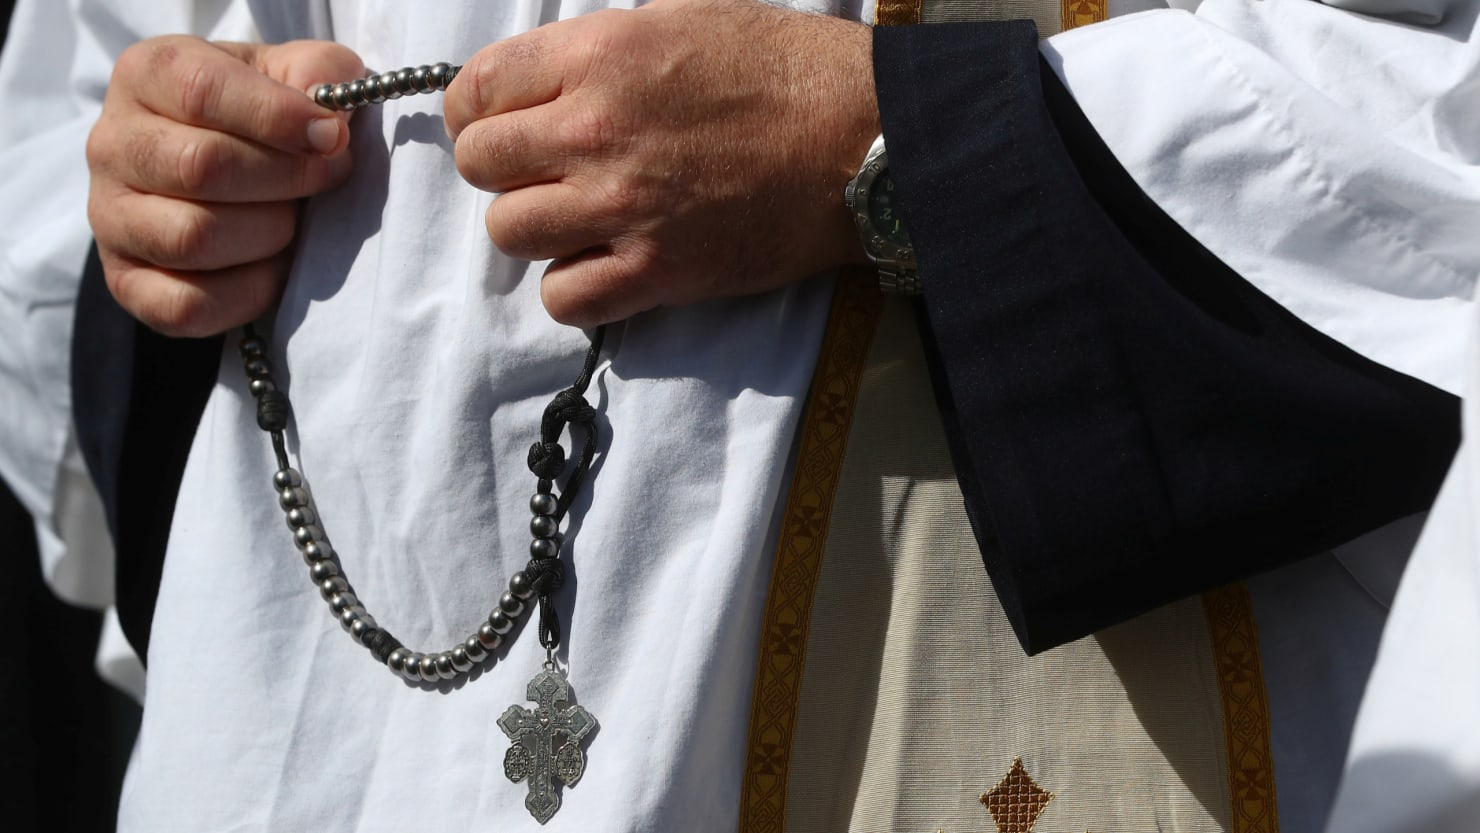 Texas Priest Accused of Groping Woman During Her Last Rites